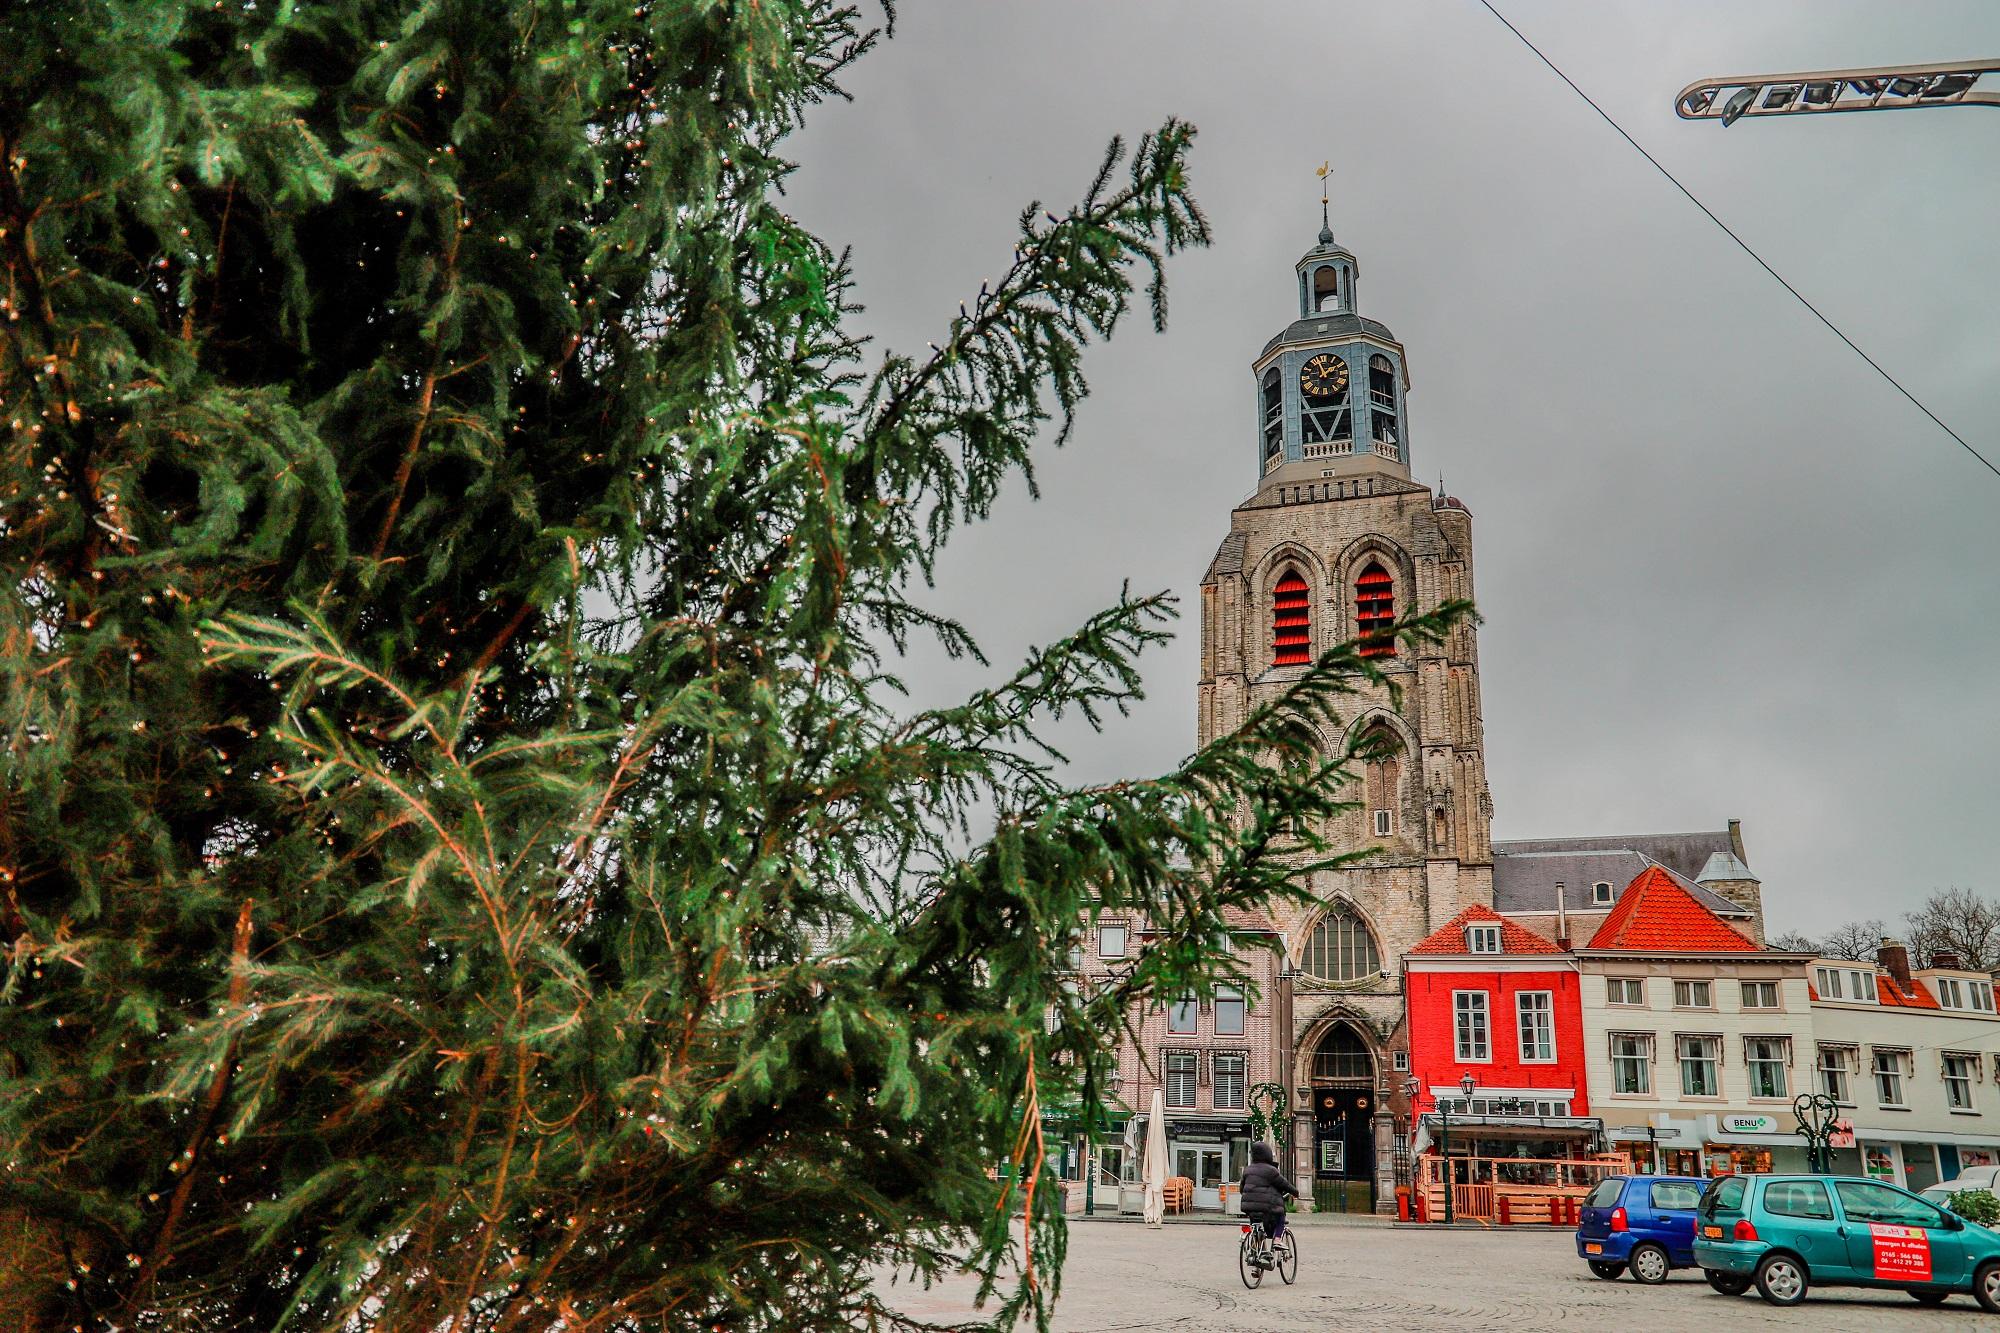 kerstboom bergen op zoom peperbus klok kerk kerkklok kerst kerstmis kerstversiering grote markt